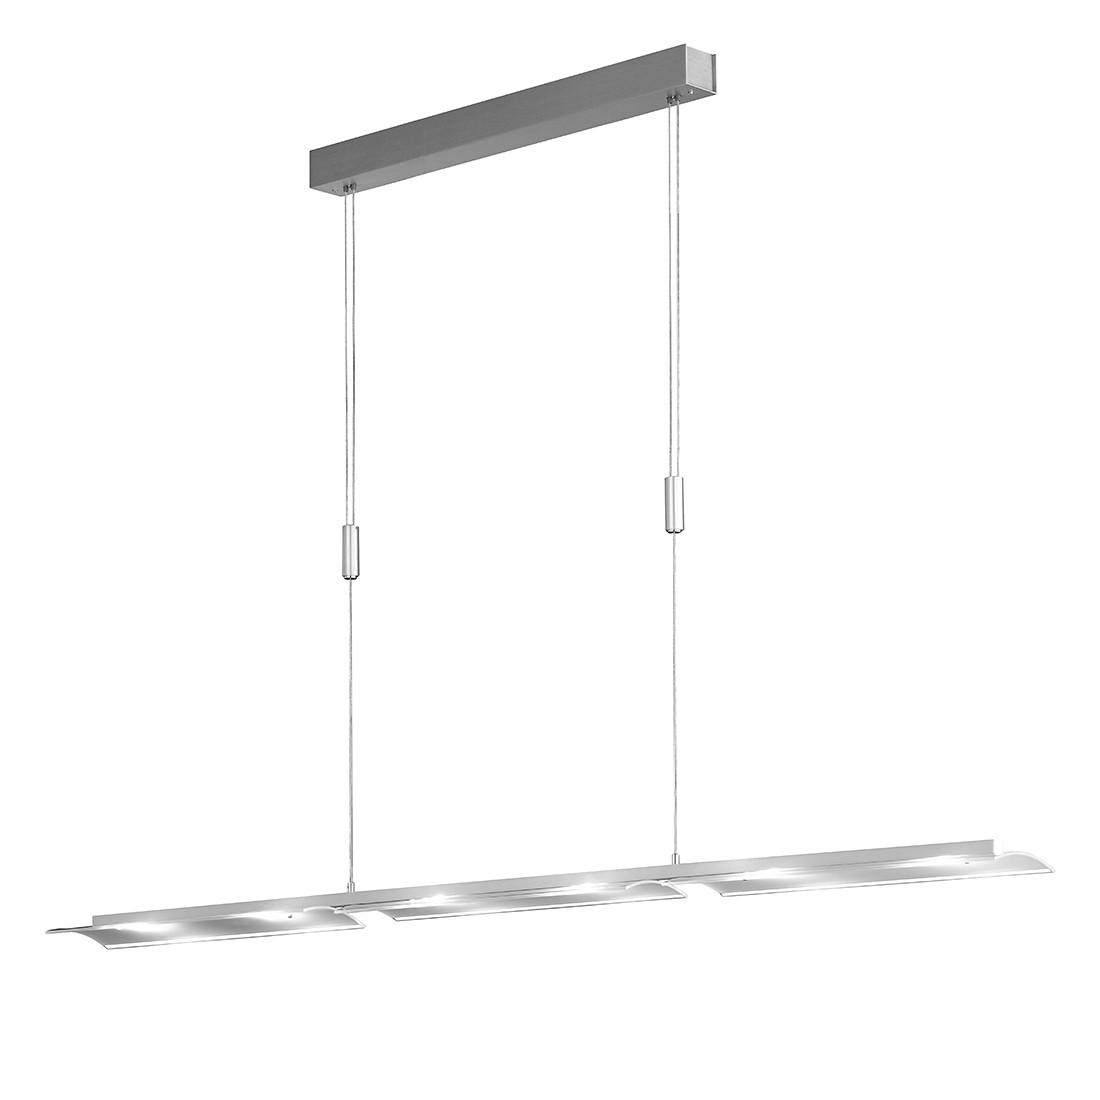 EEK A+, LED - Pendelleuchte Lomia - Metall/Glas - Silber, Honsel